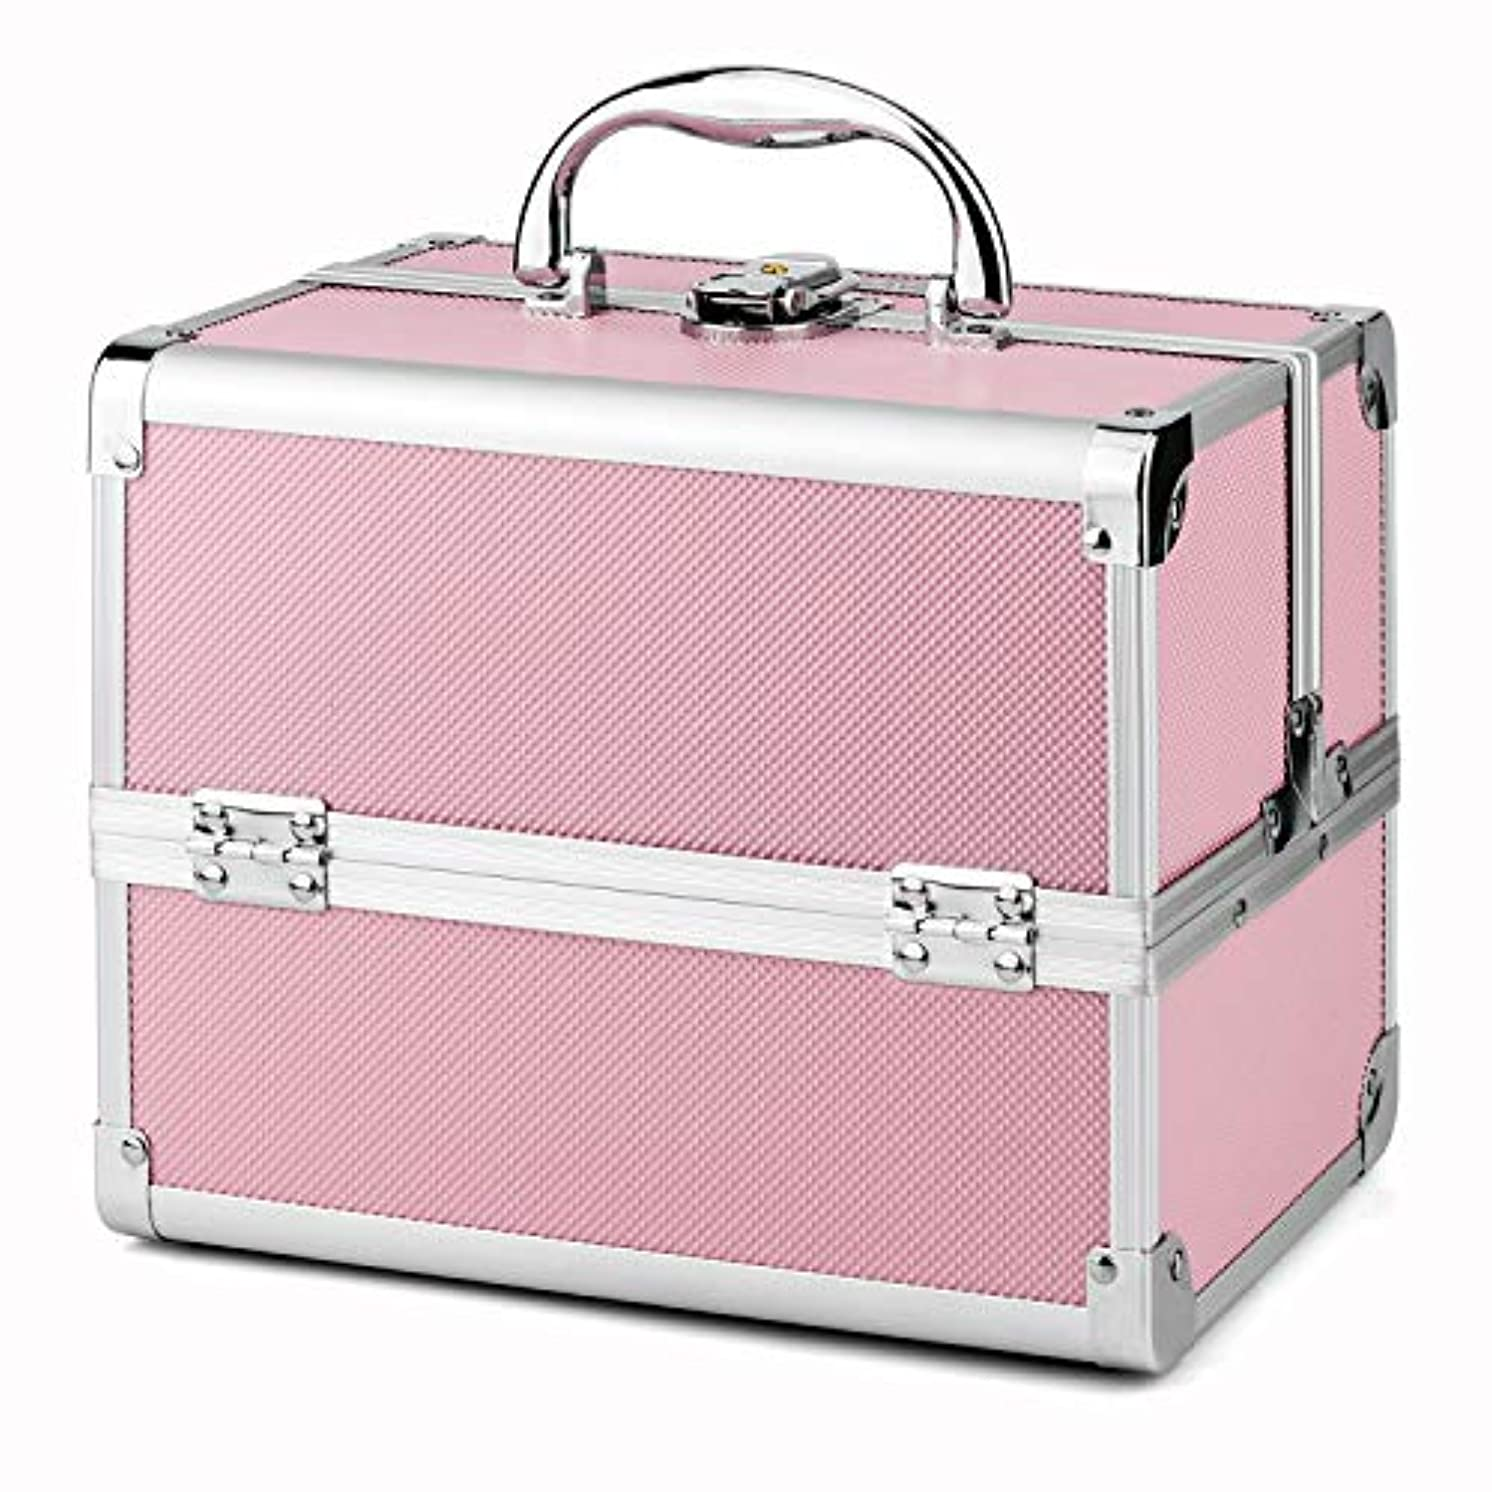 Amasava メイクボックス 収納ボックス 大容量 プロ用 コスメボックス 鏡付き 収納ケース 化粧品?化粧道具入れ 自宅?出張?旅行?アウトドア撮影などに対応 ハンドル付持ち運び便利 収納力抜群 鍵付き ピンク